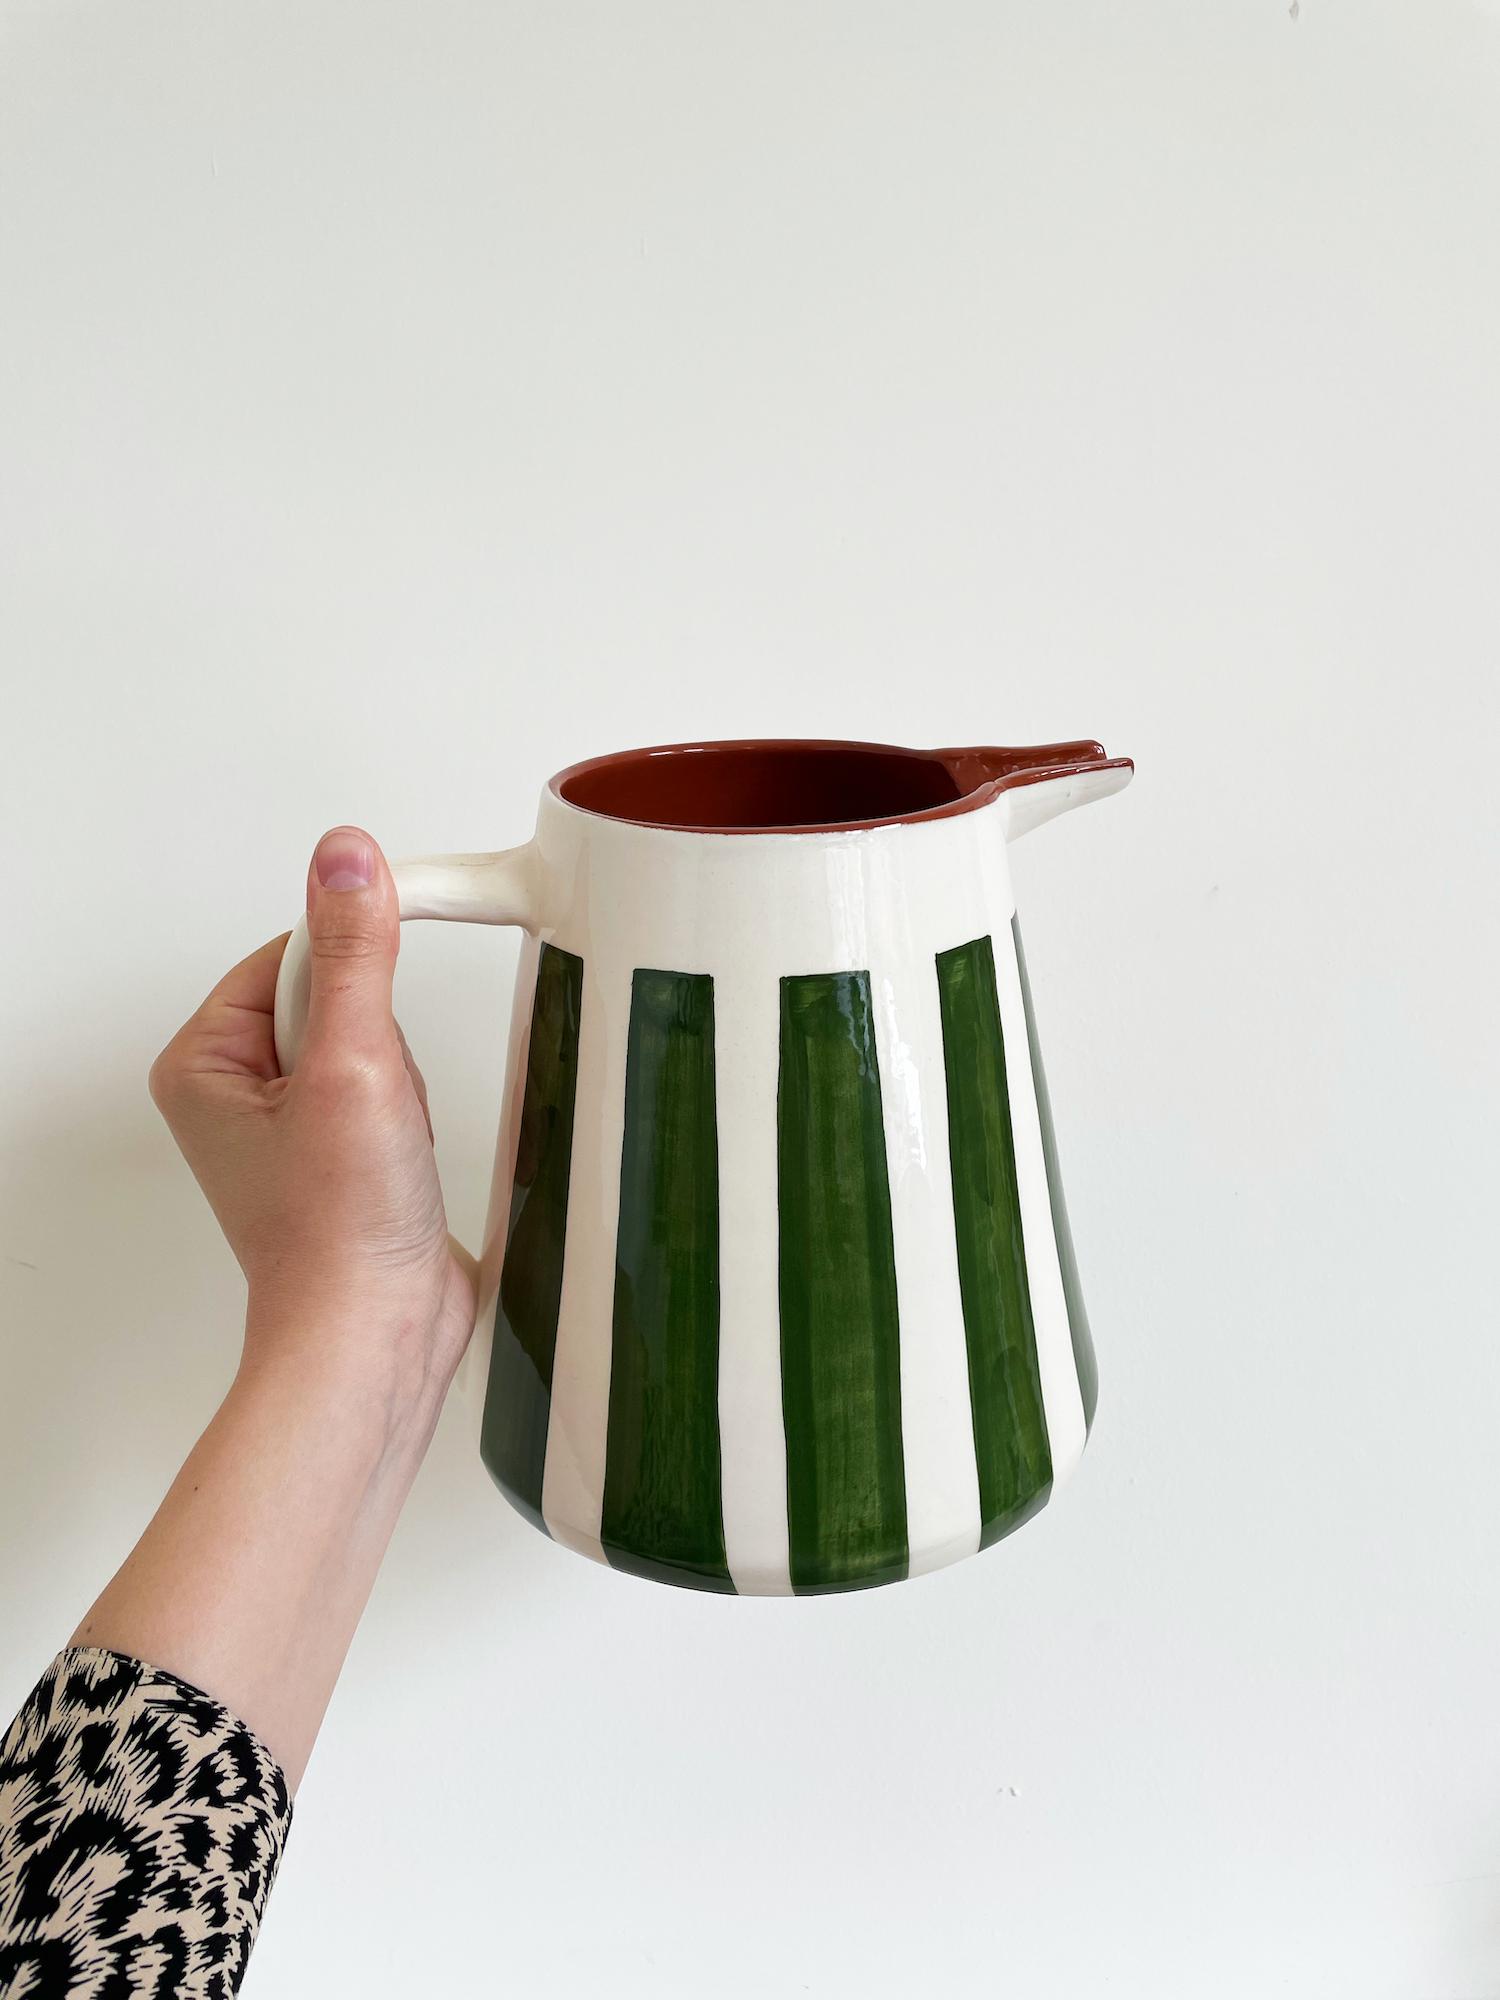 Green Striped Jug - Handmade in Portugal